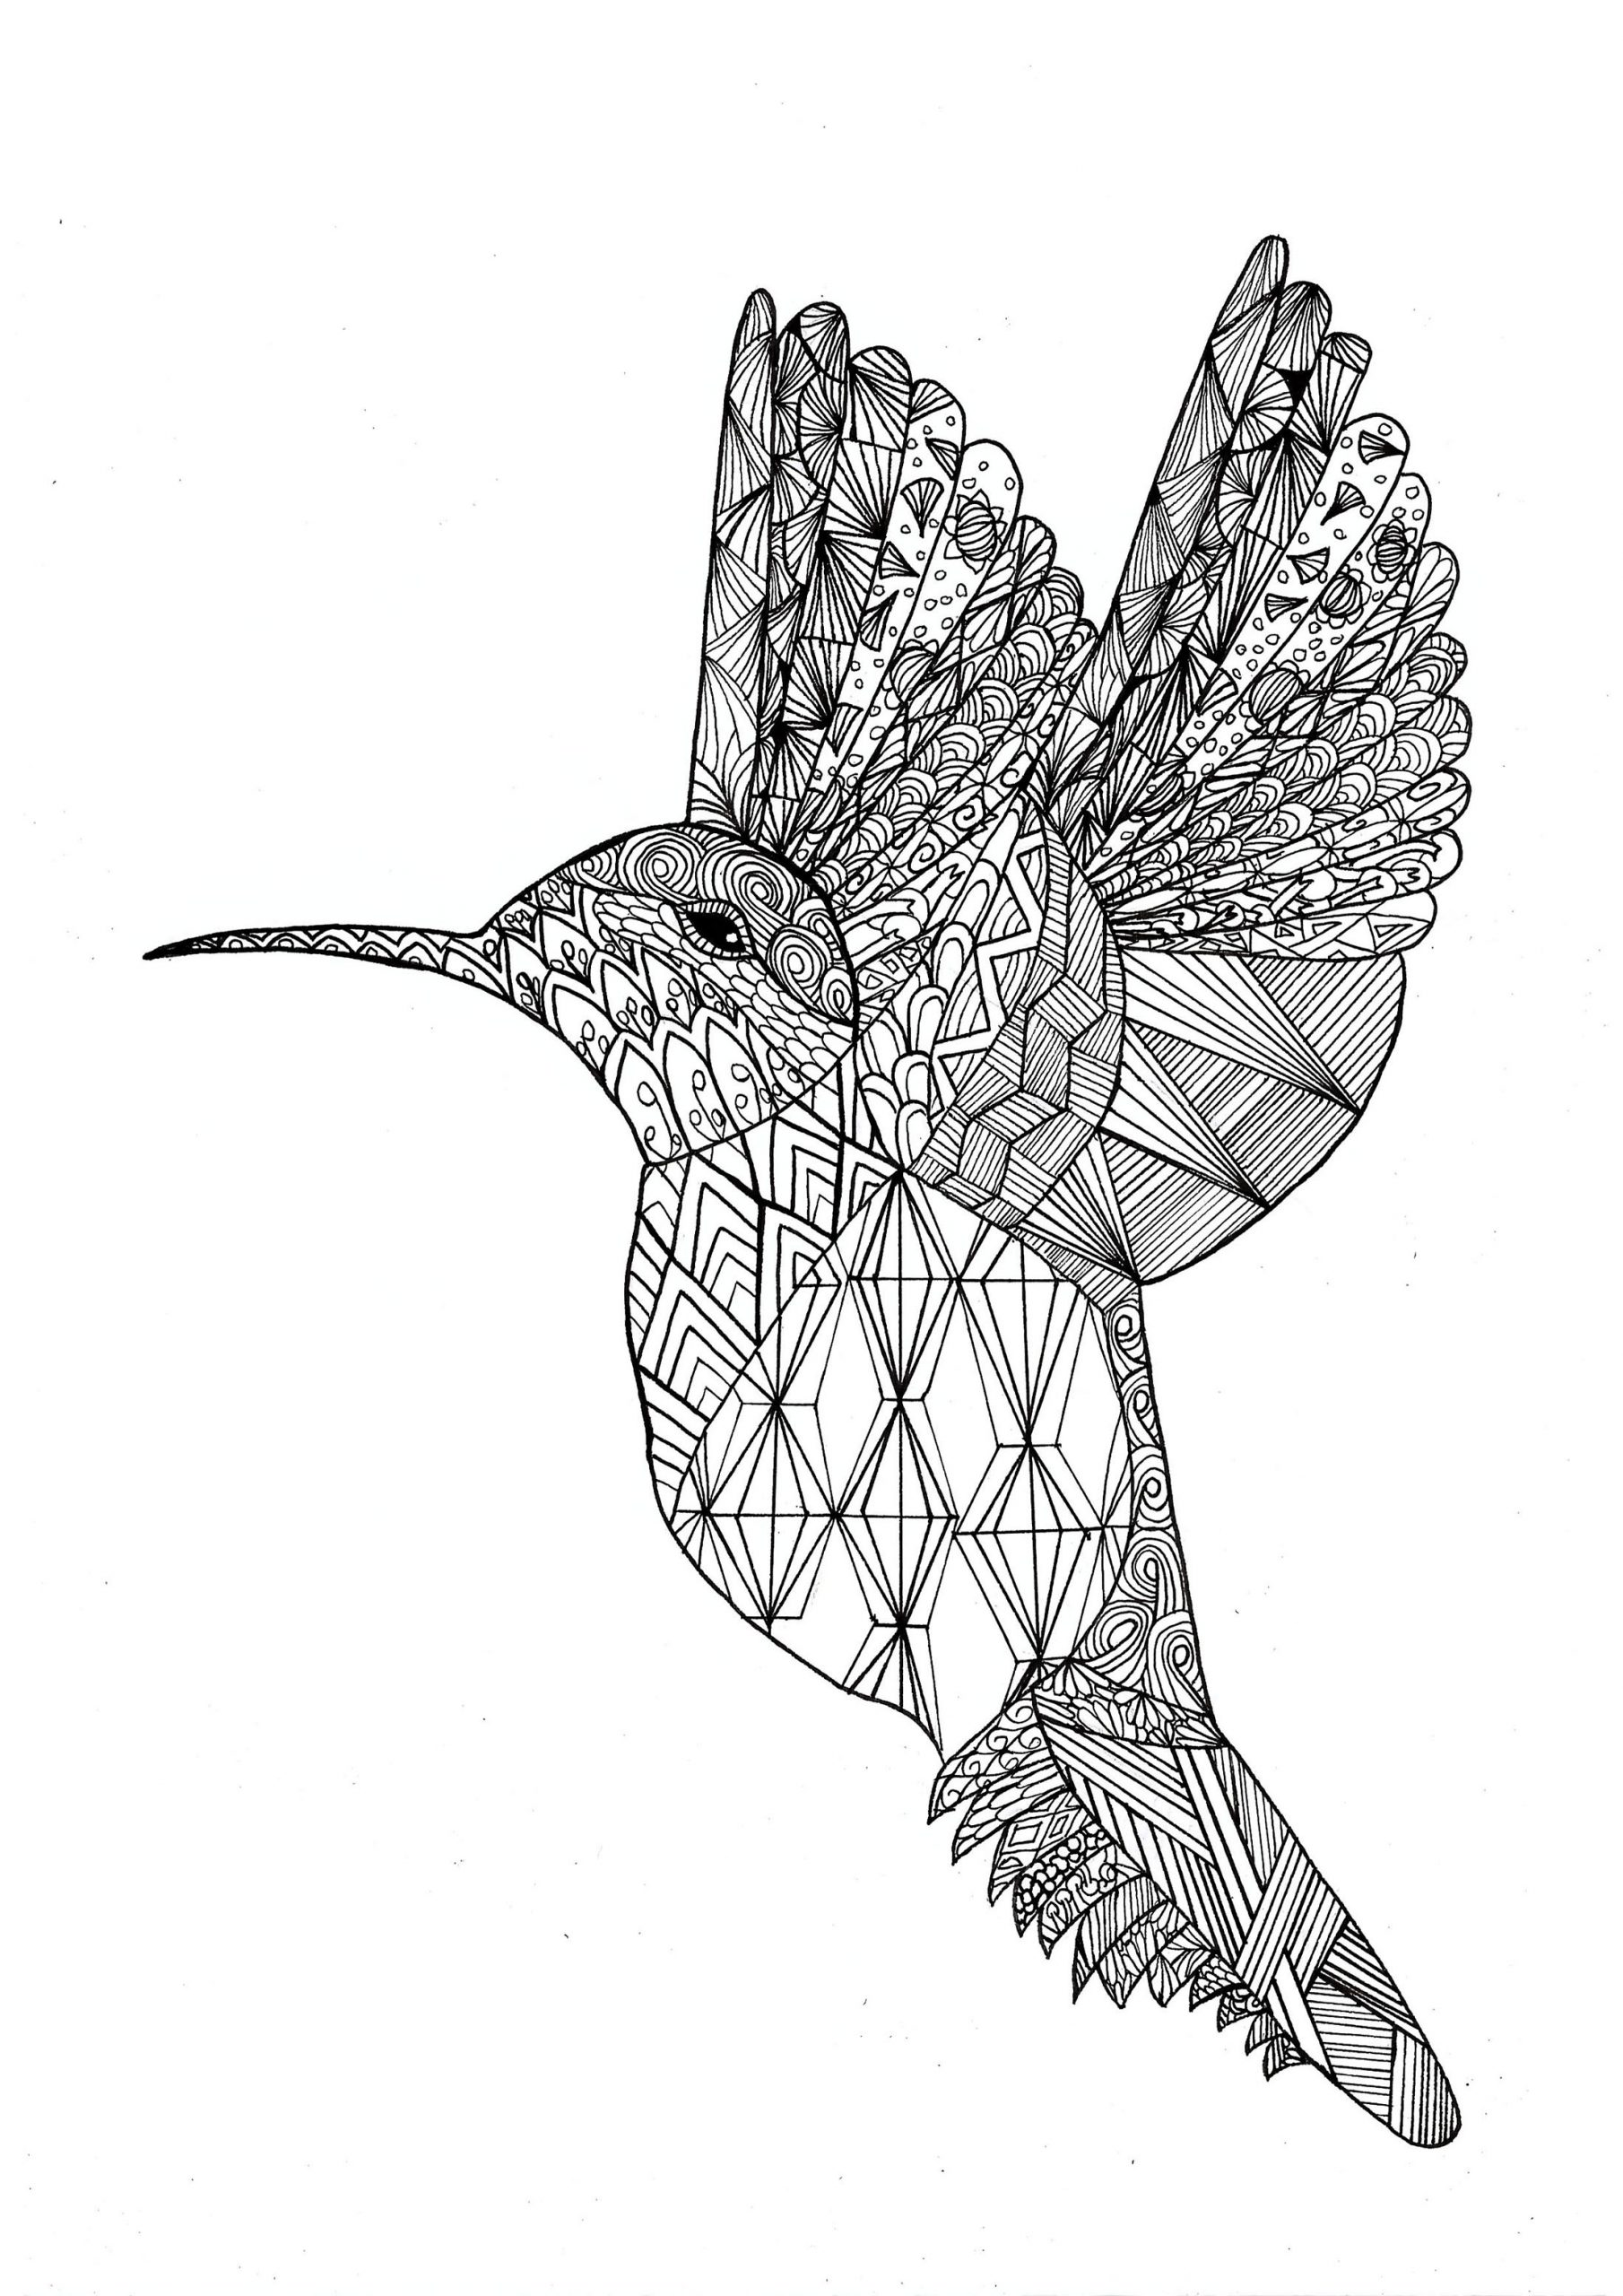 Vogel 22808 - Vögel - Malbuch Fur Erwachsene über Mandala Vogel